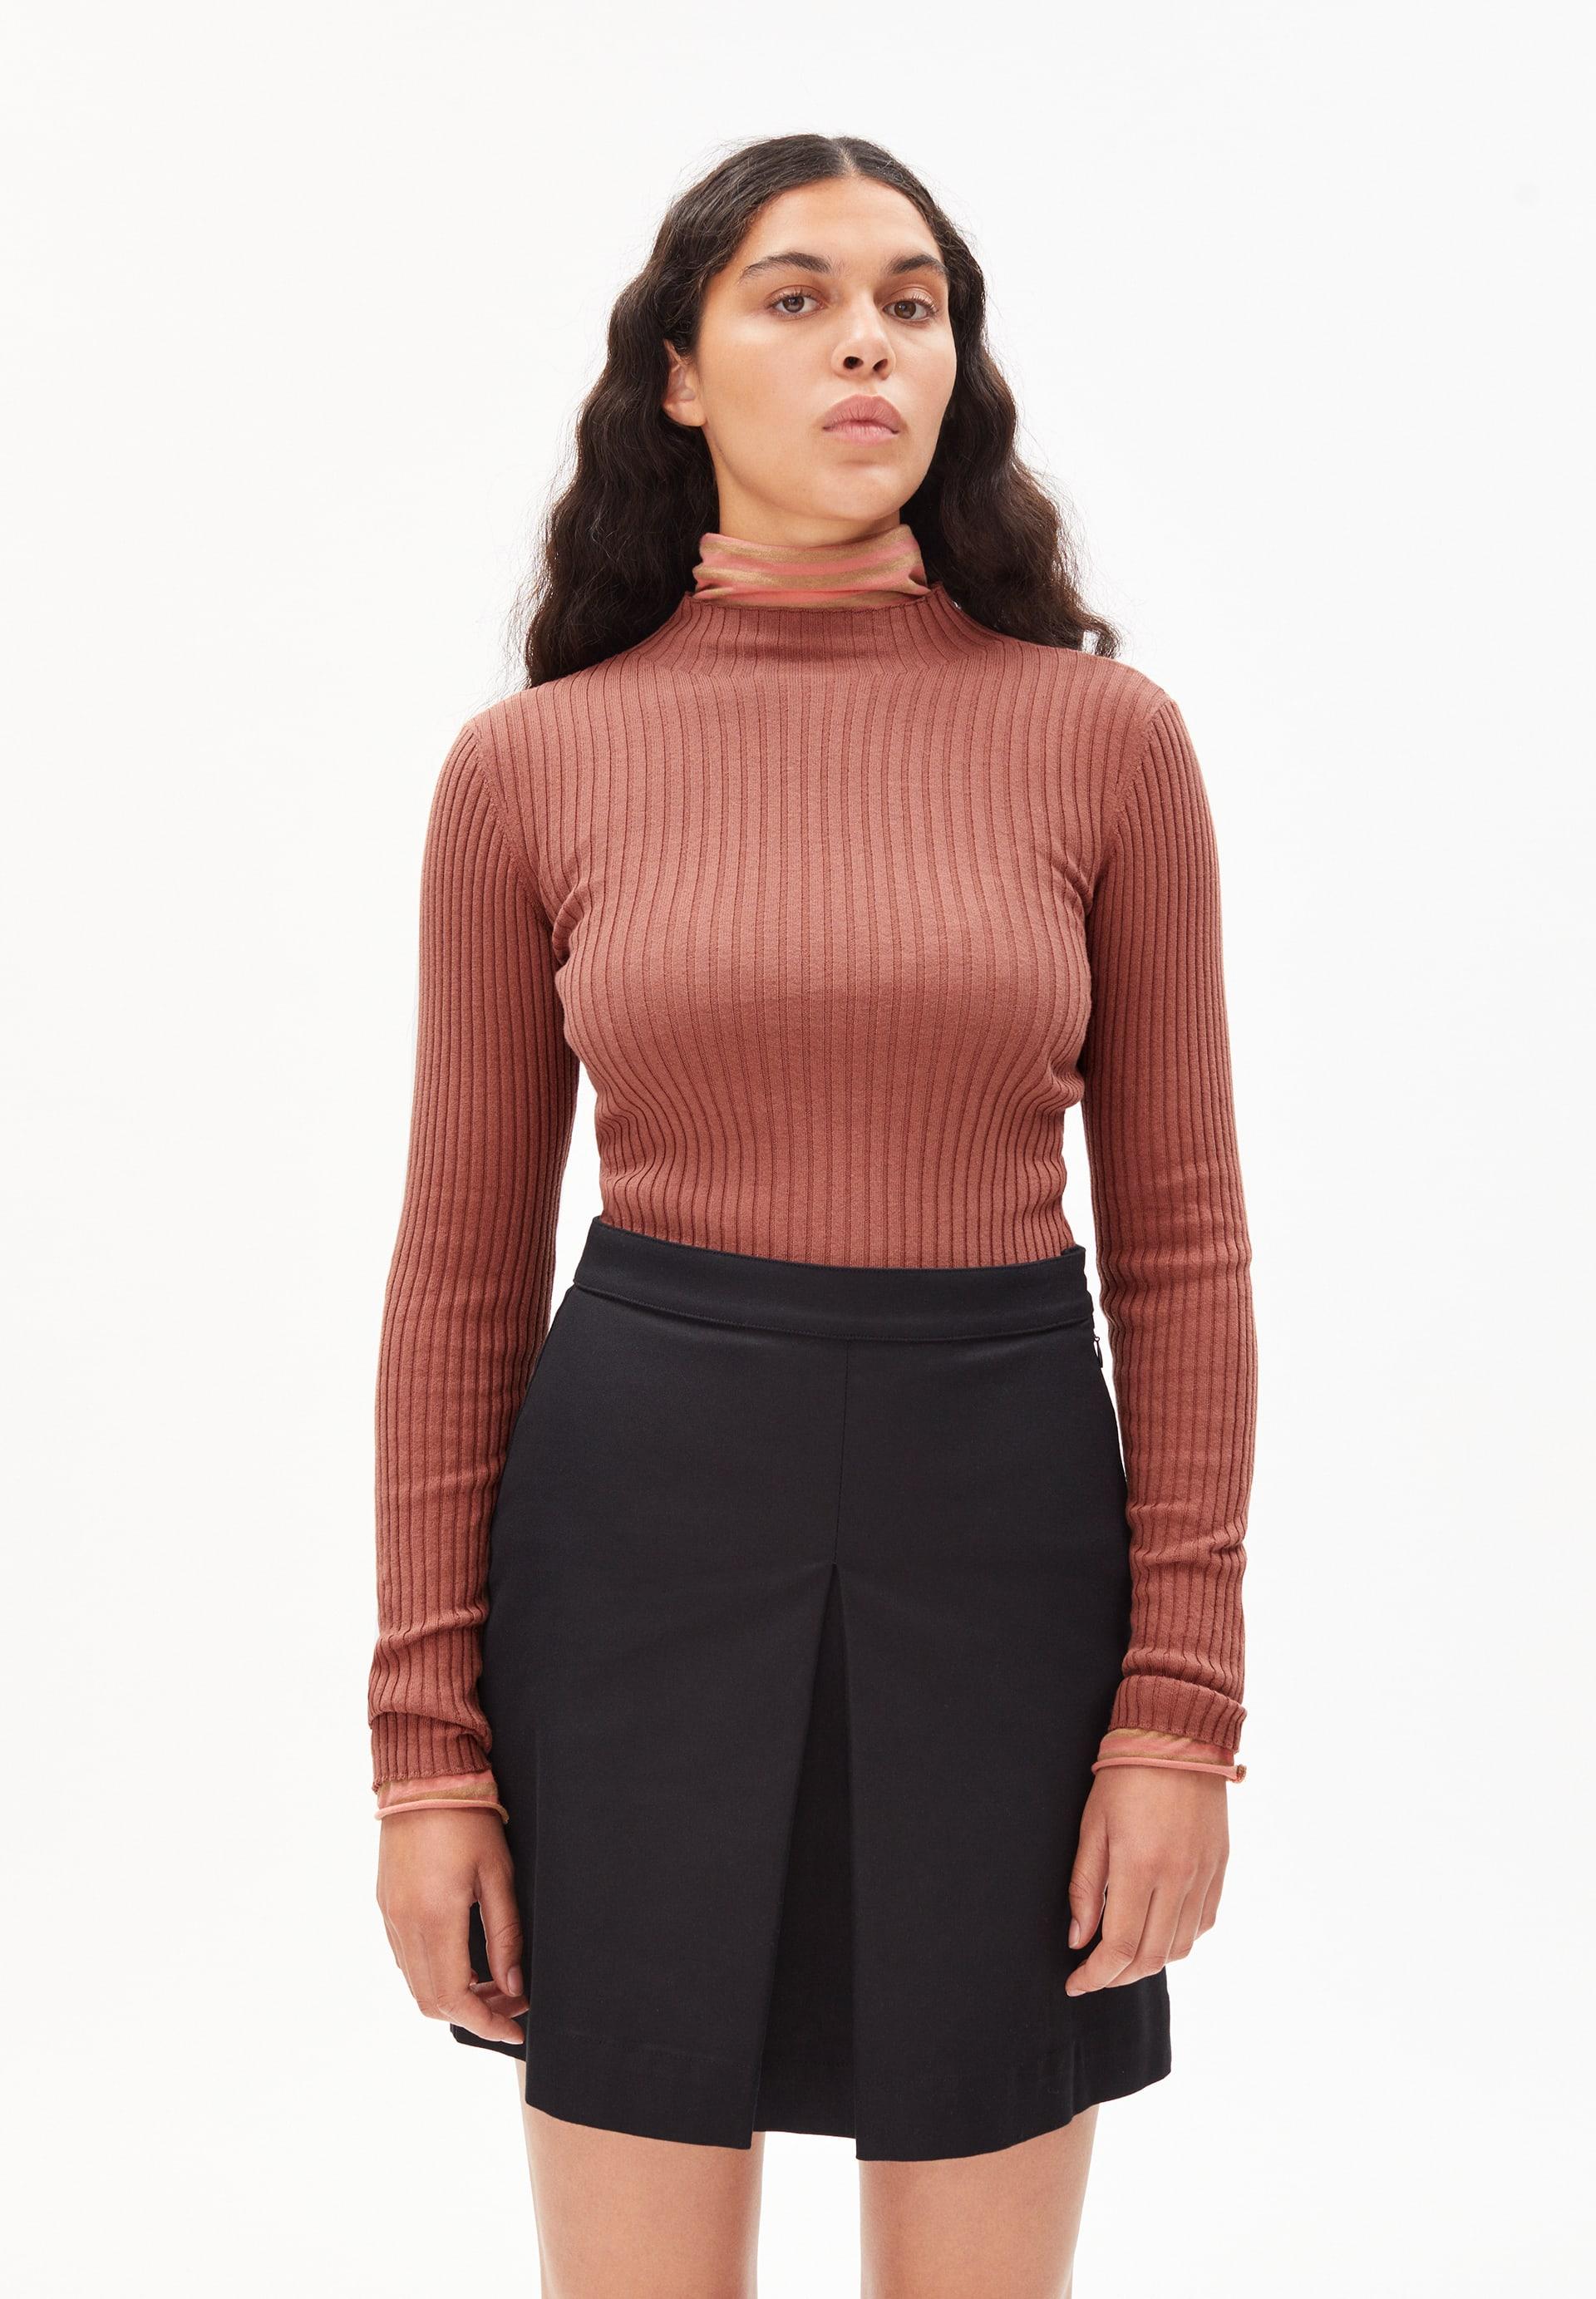 ALAANI Sweater made of Organic Cotton